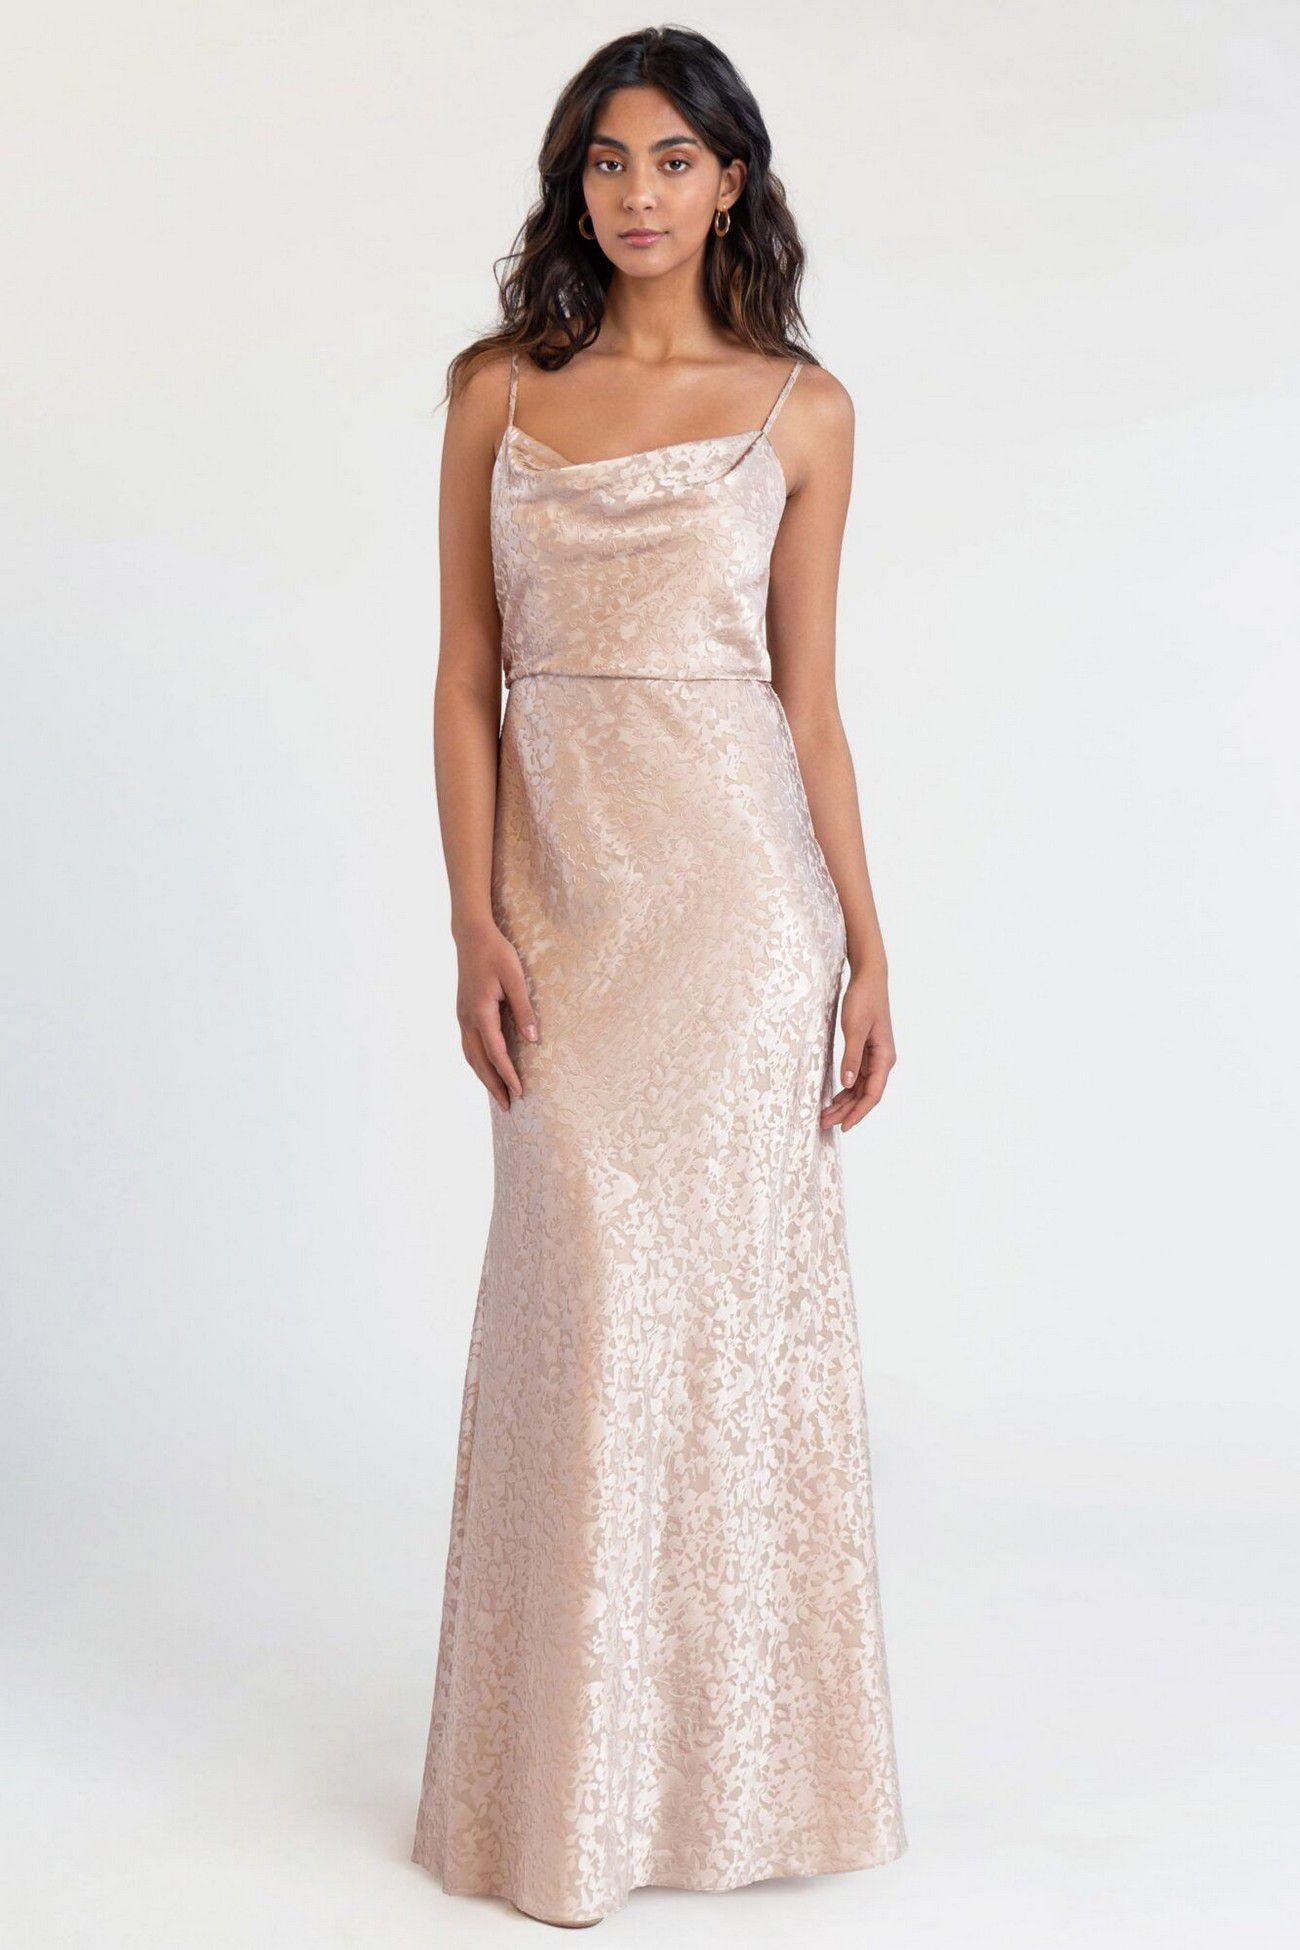 https://www.bridalreflections.com/wp-content/uploads/2021/04/Dahlia_Satin_1-min-1333x2000.jpg